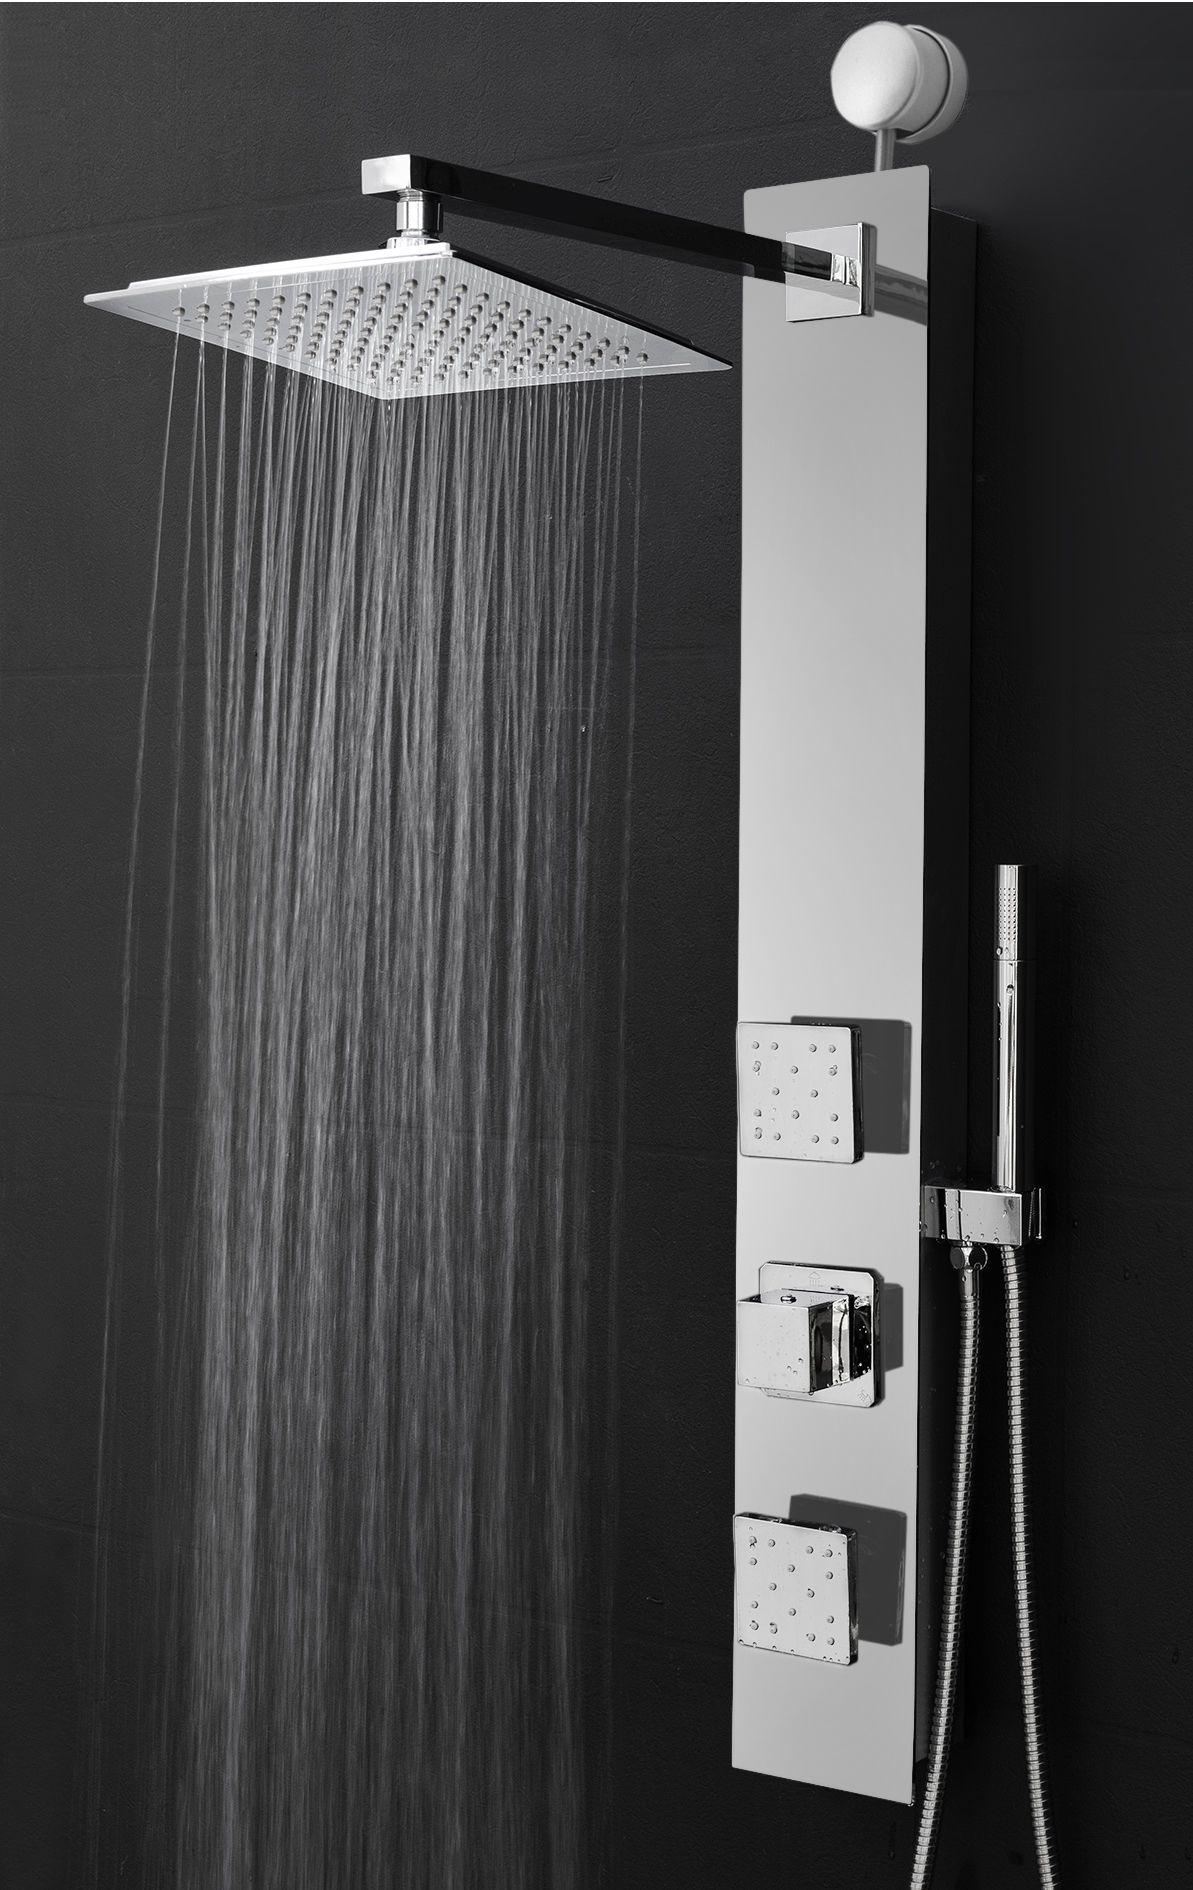 Home Improvement In 2020 Shower Panels Shower Heads Adjustable